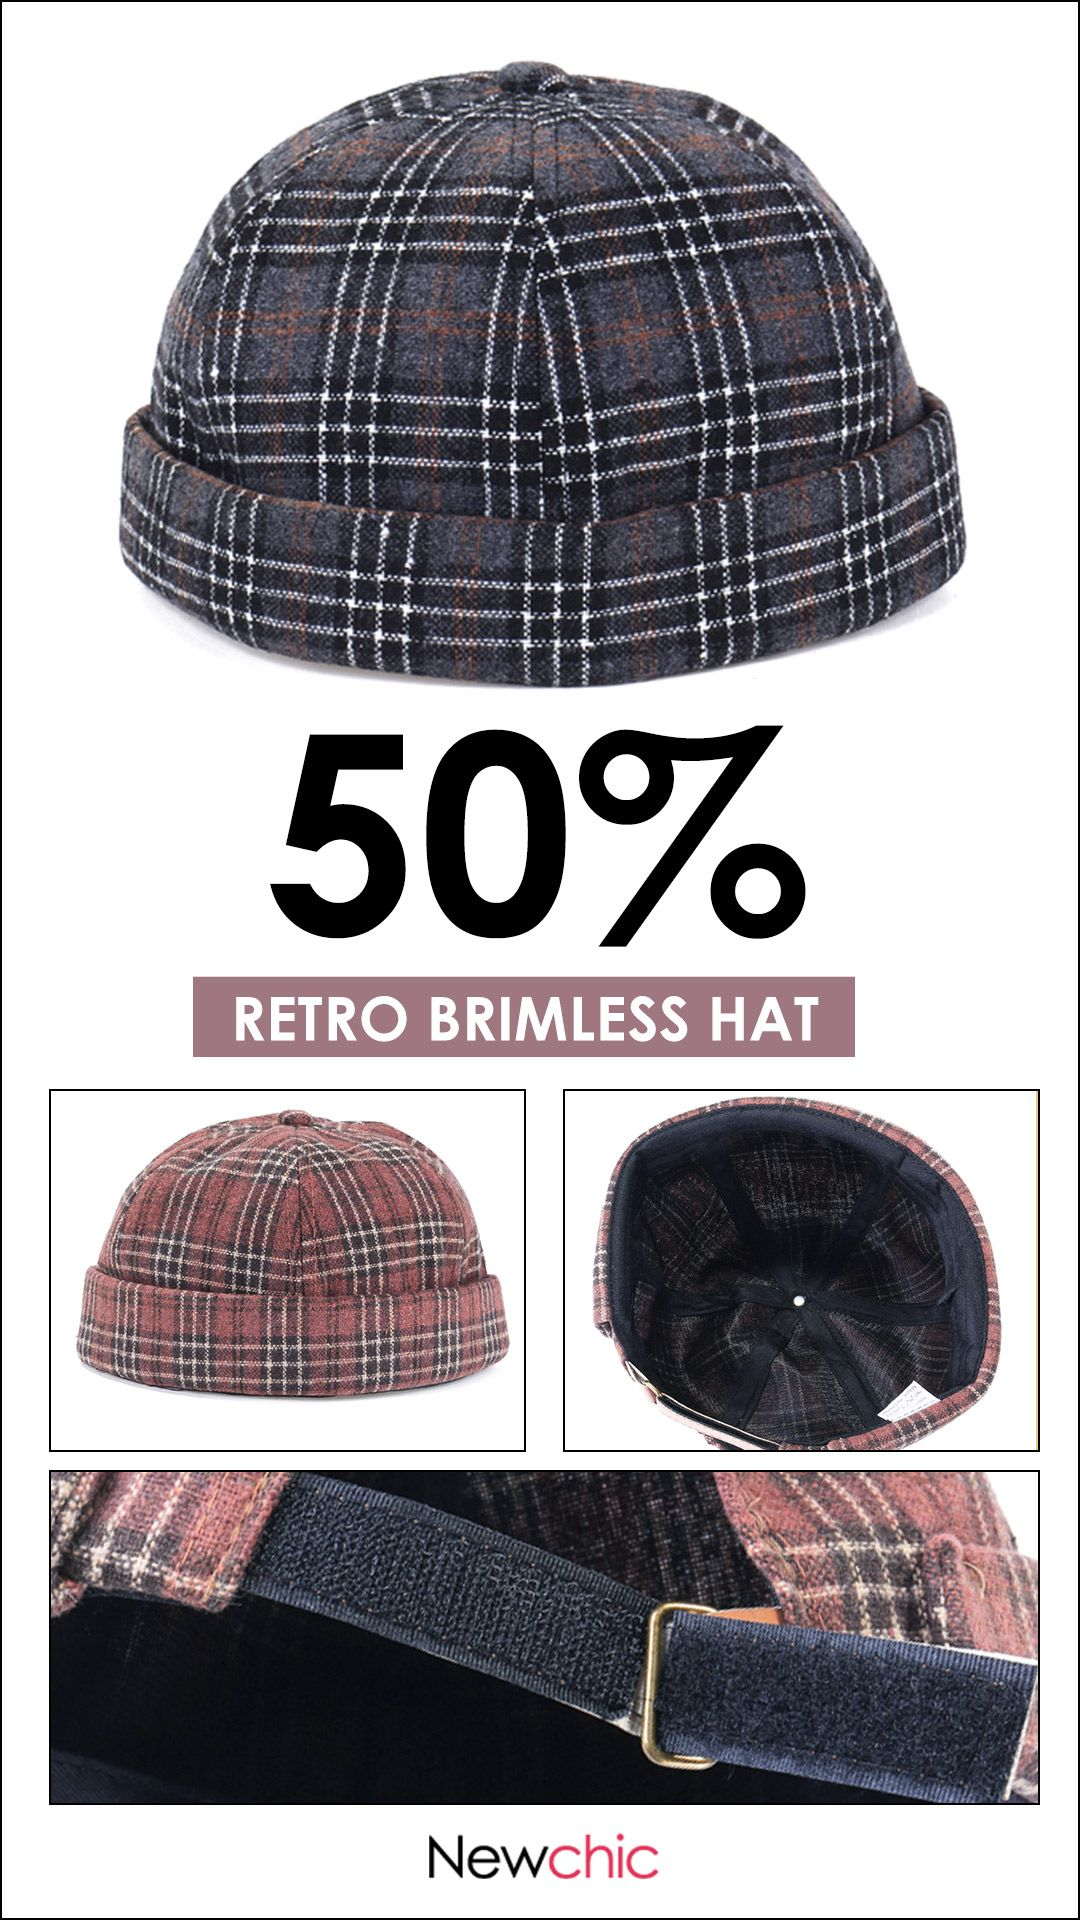 41a212204dc3f Dome Grid Skullcap Sailor Cap Rolled Cuff Brimless Hat Woolen Blend Beret  Caps  cap  hat  retro  vintage